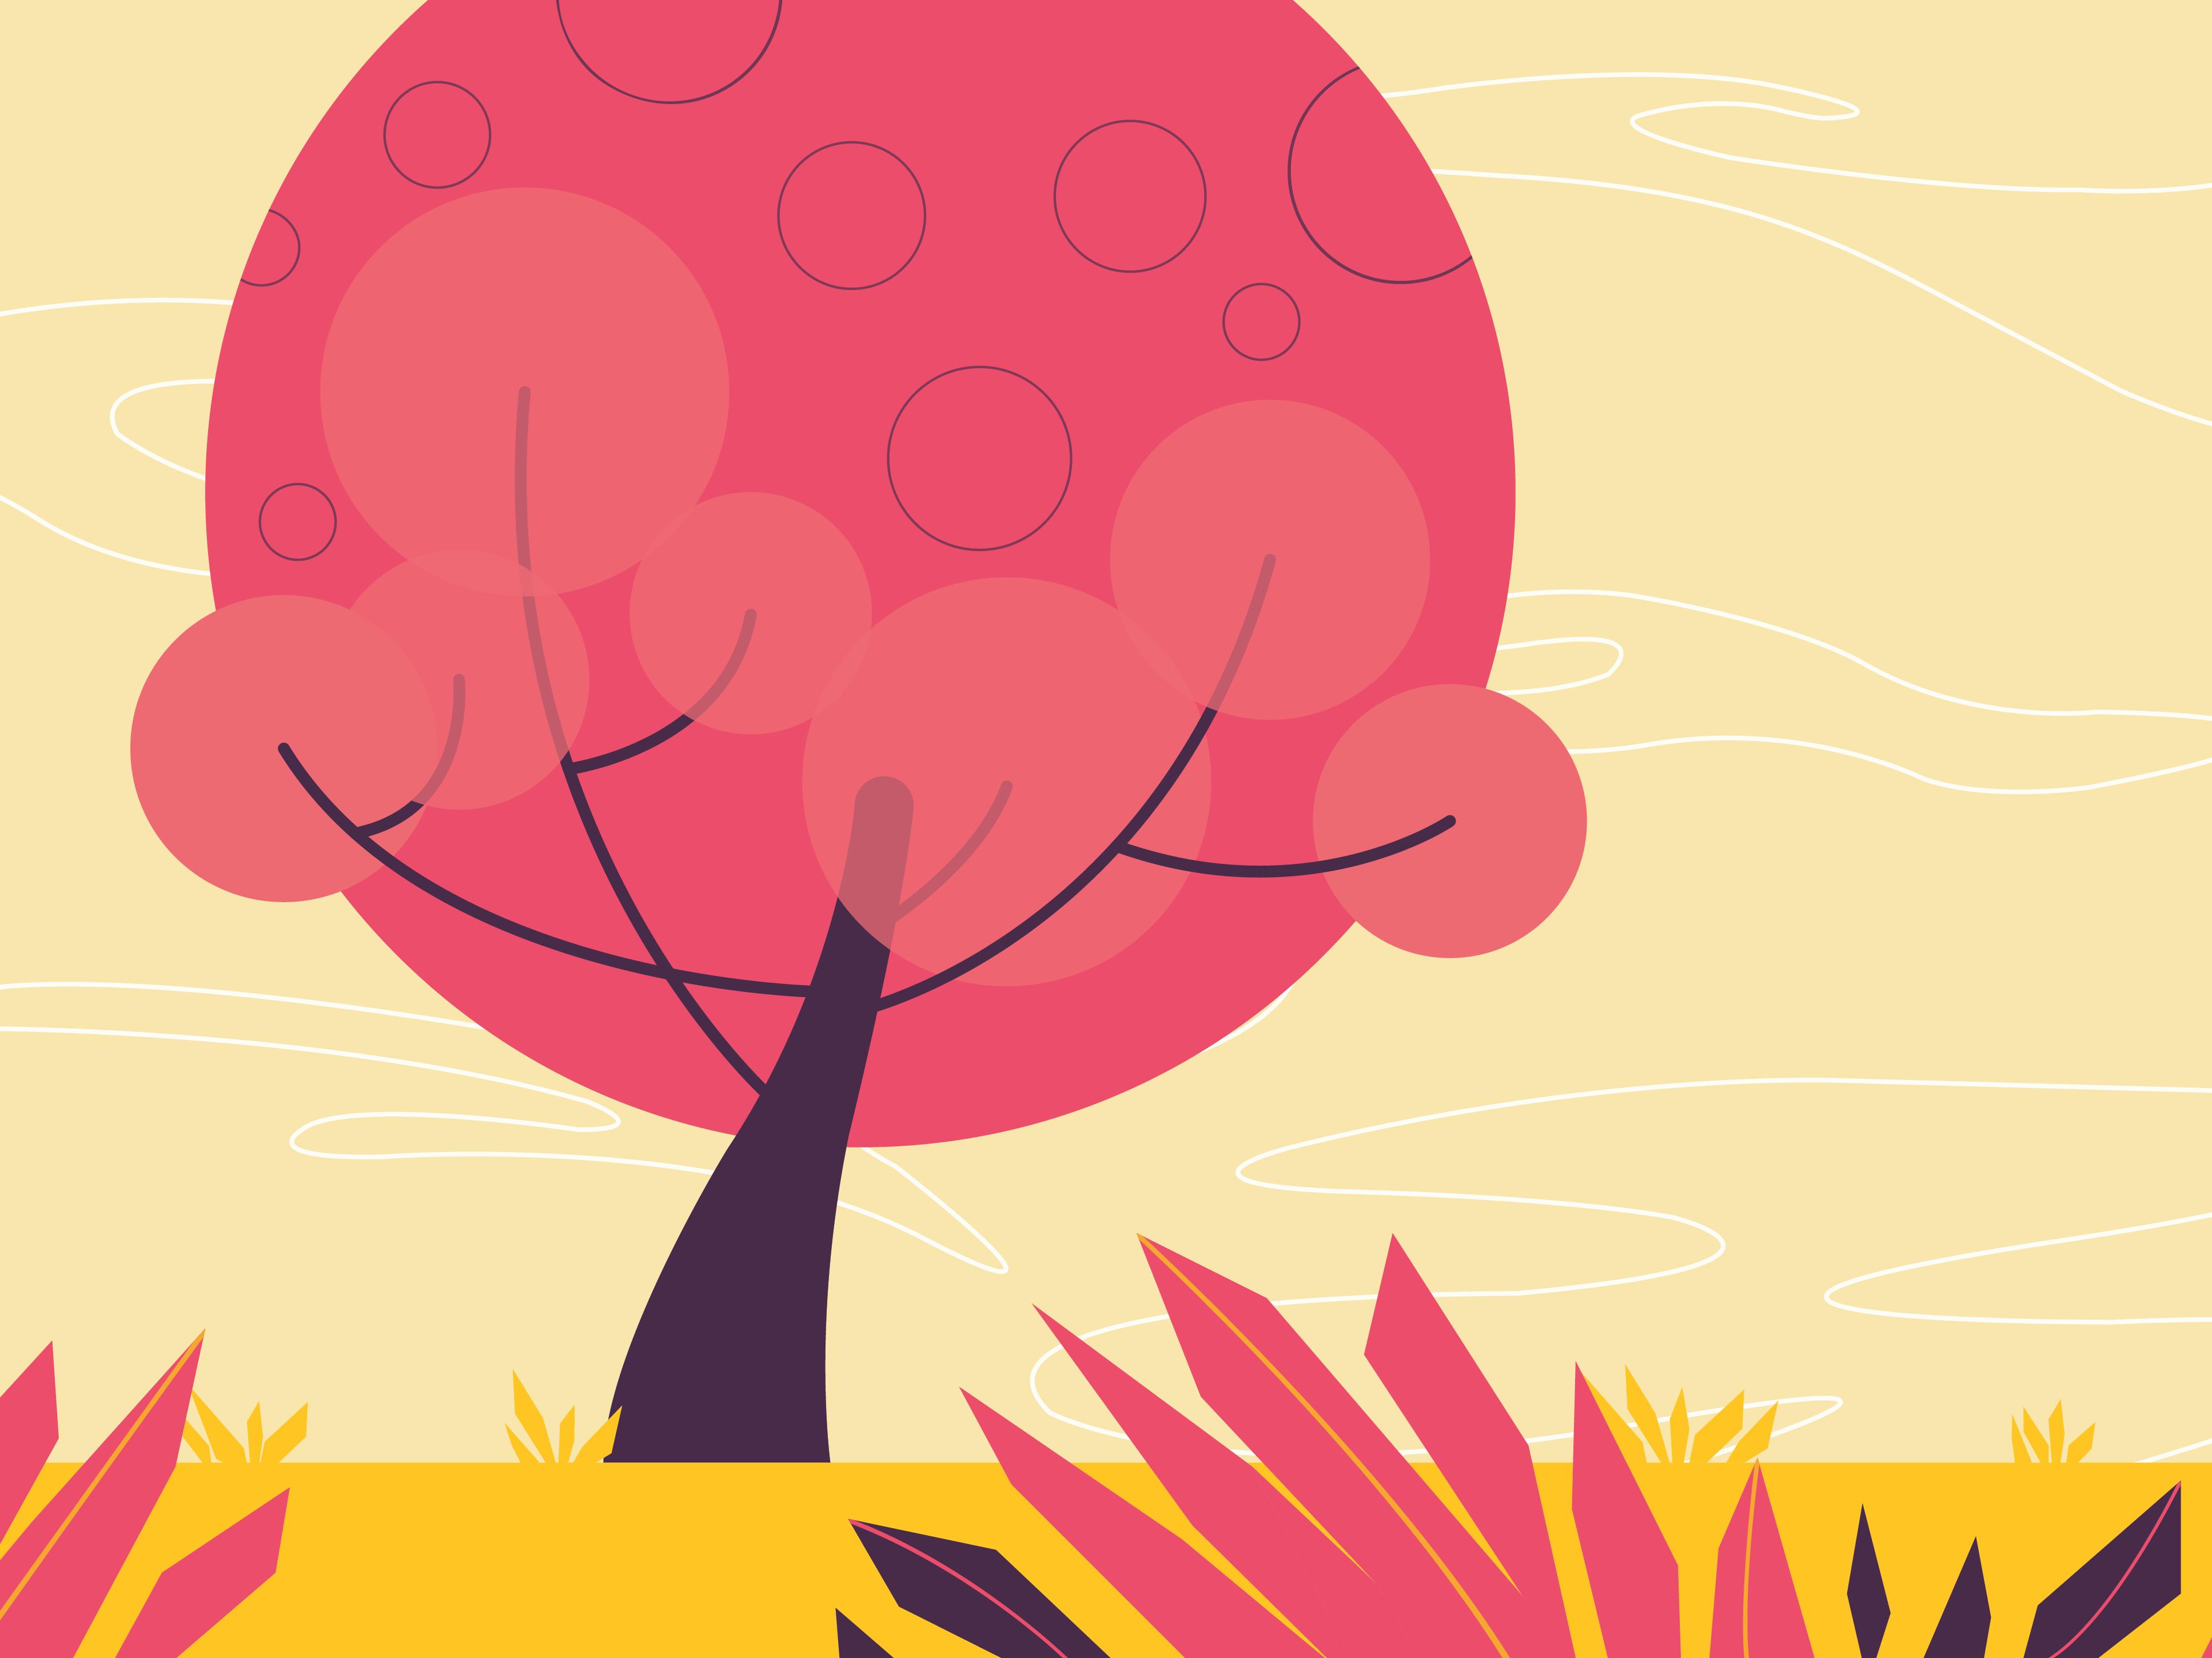 Tree 01 01